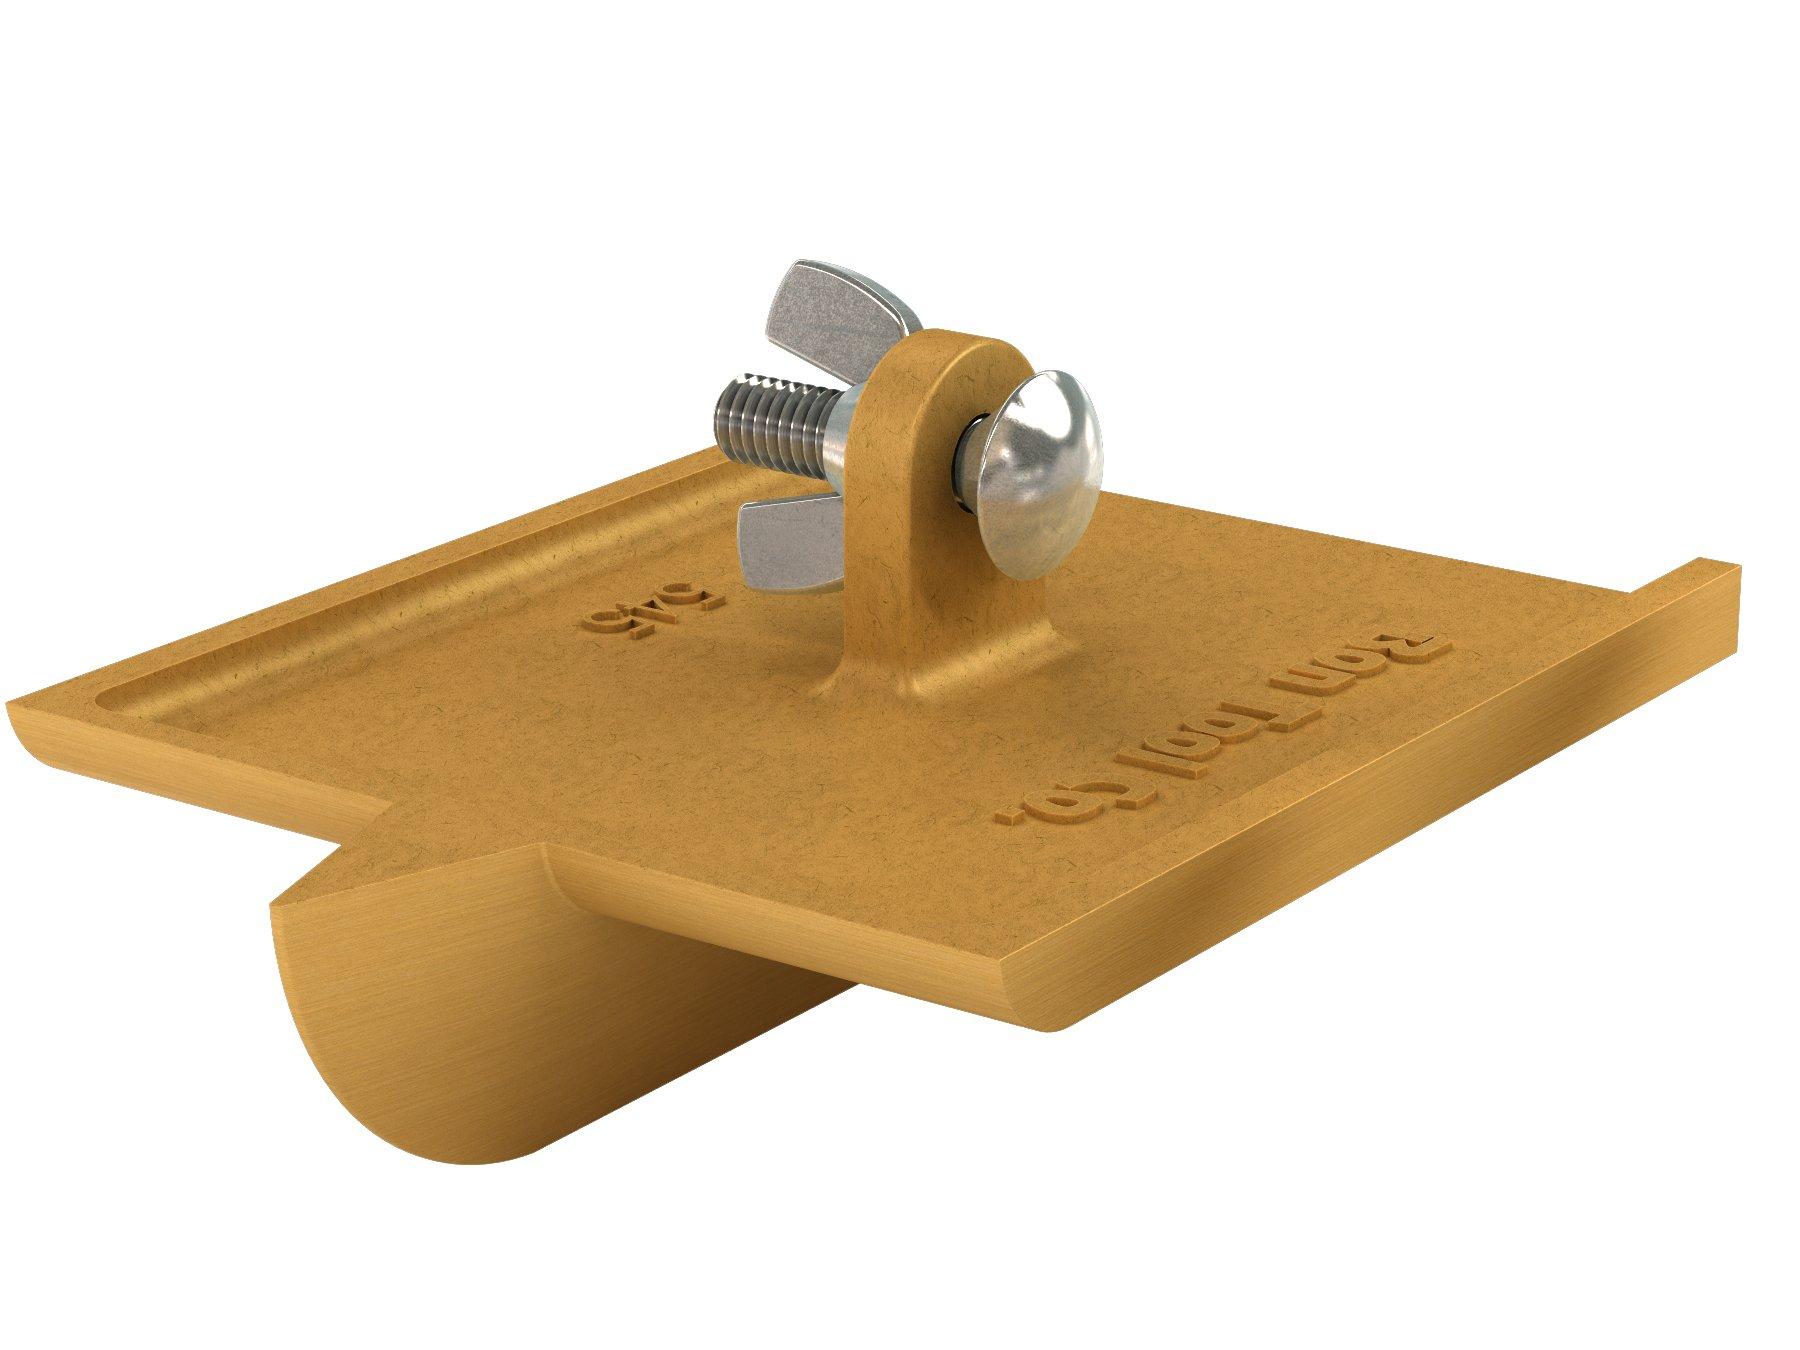 Bon 12-545 6-Inch by 4-1/2-Inch Bronze Walking Concrete Groover, 1-Inch Bit Depth, 1/2-Inch Bit Width